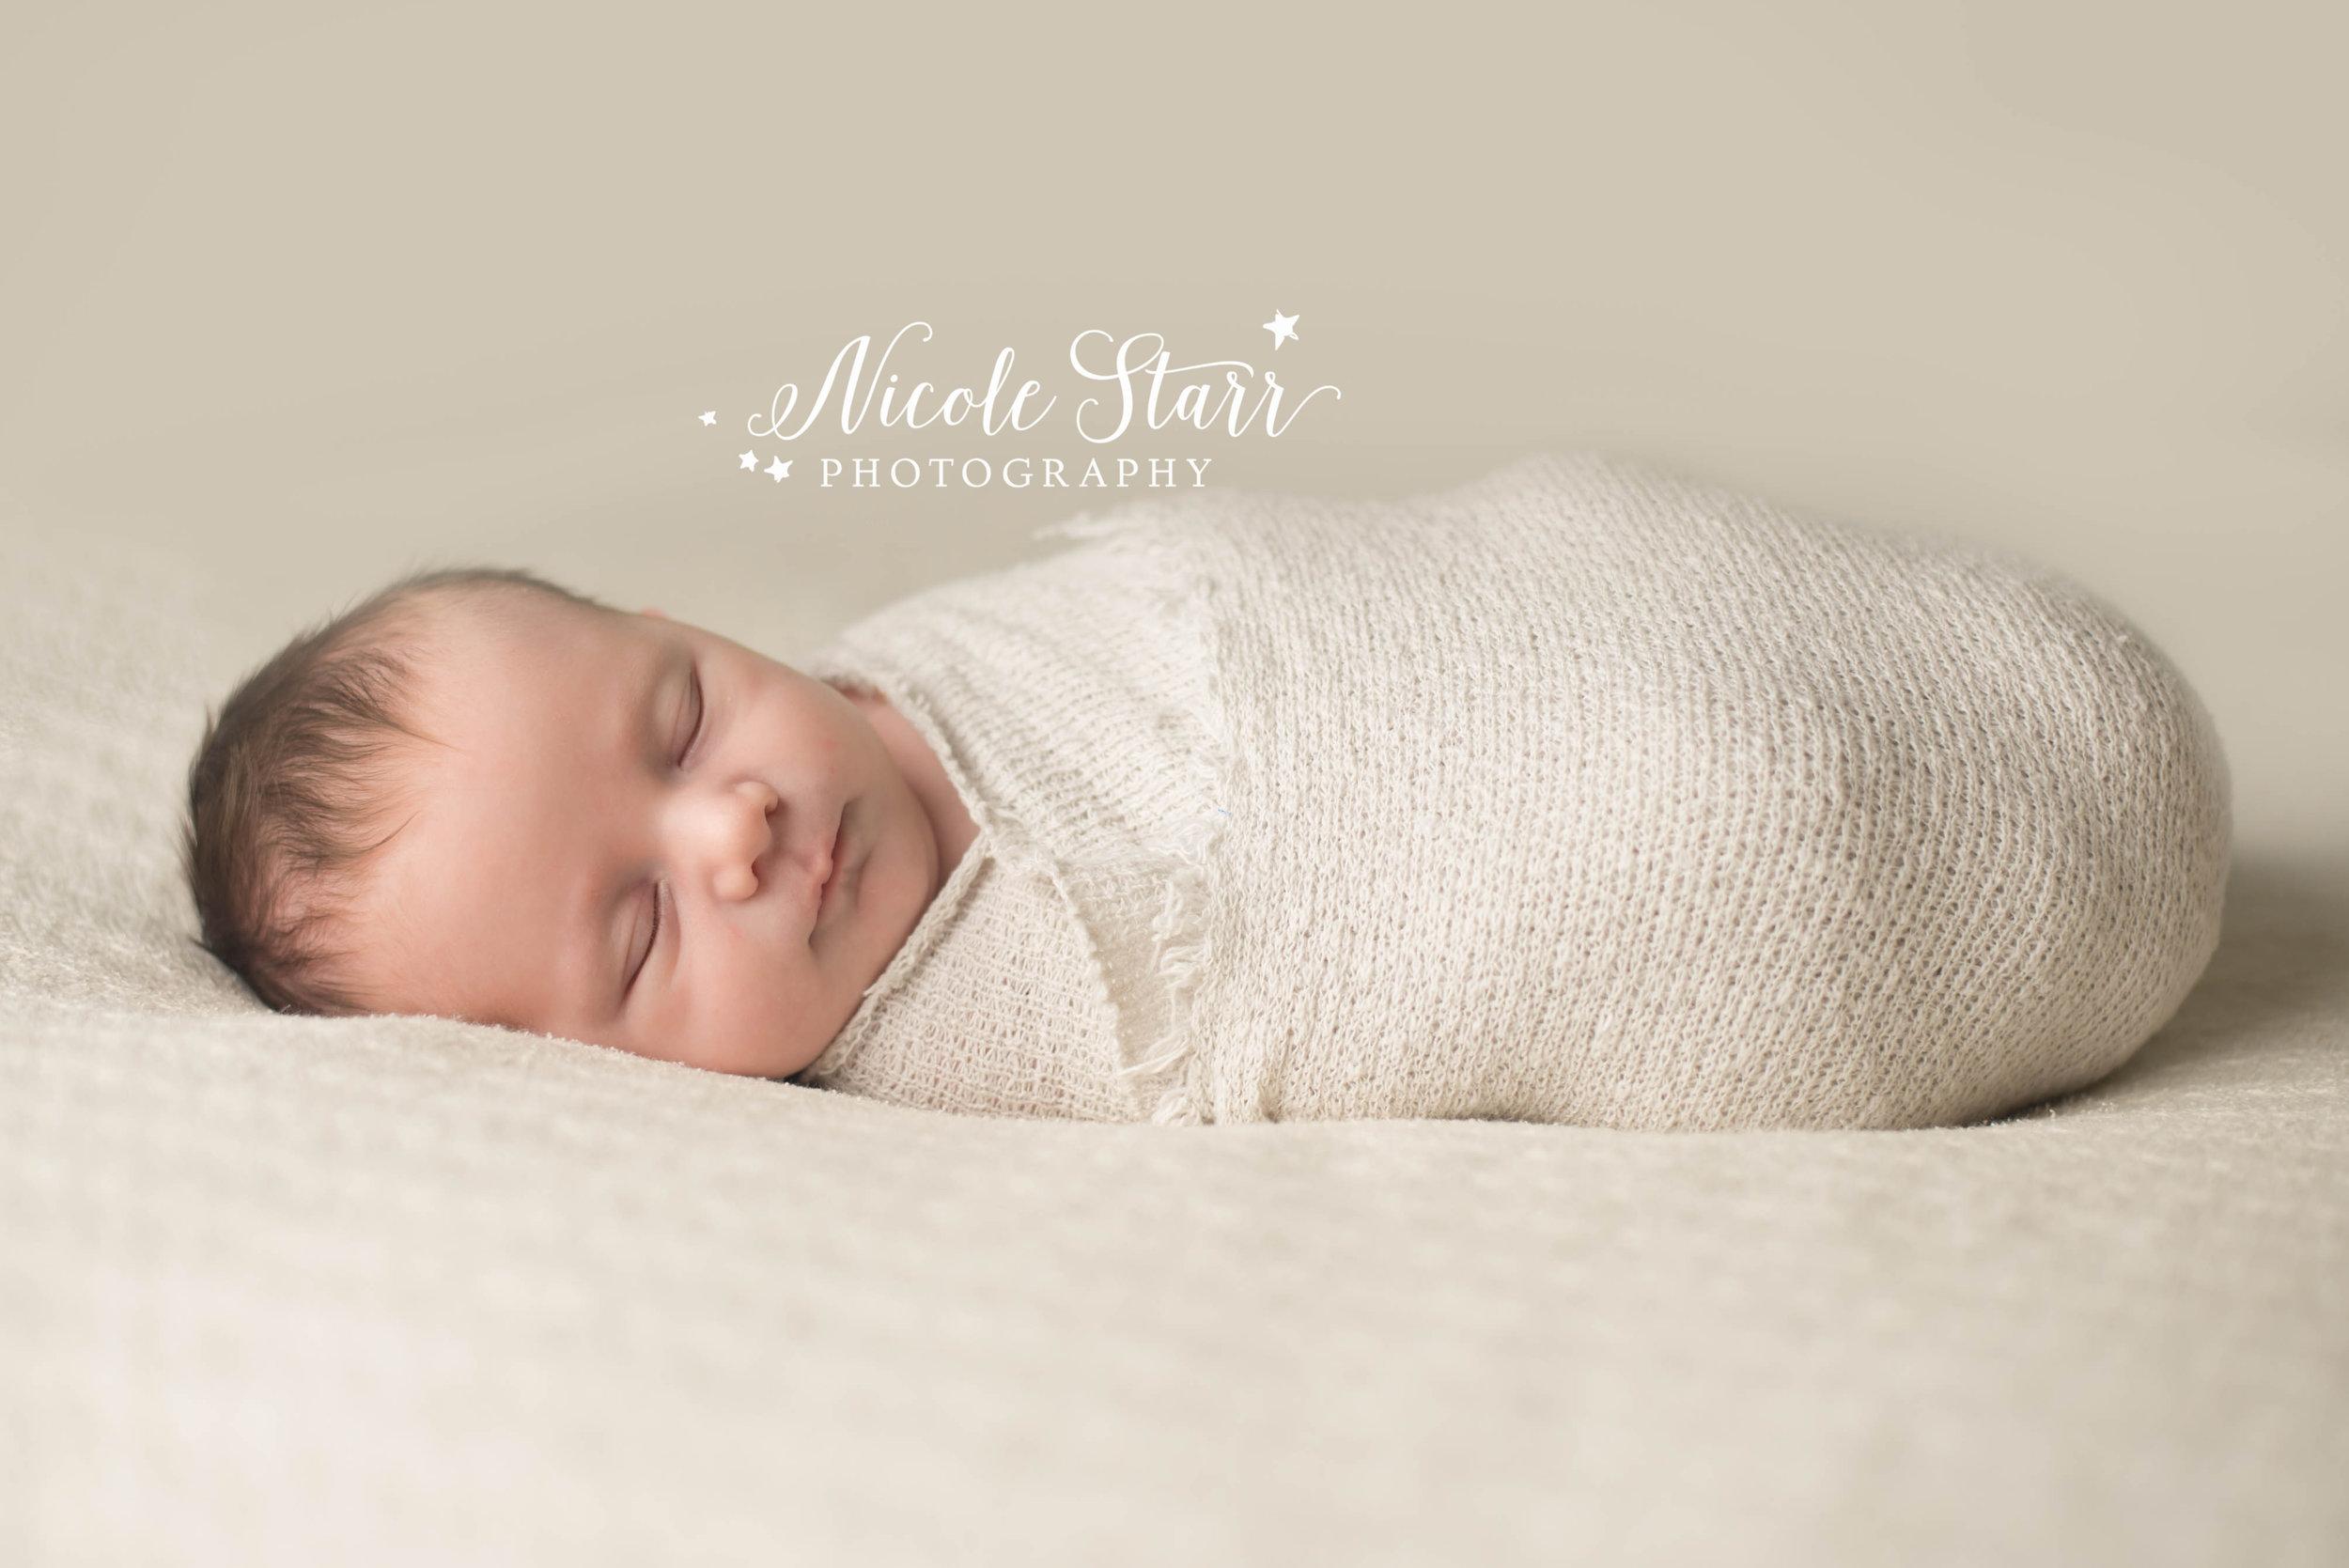 WM nicole starr photography-30.jpg